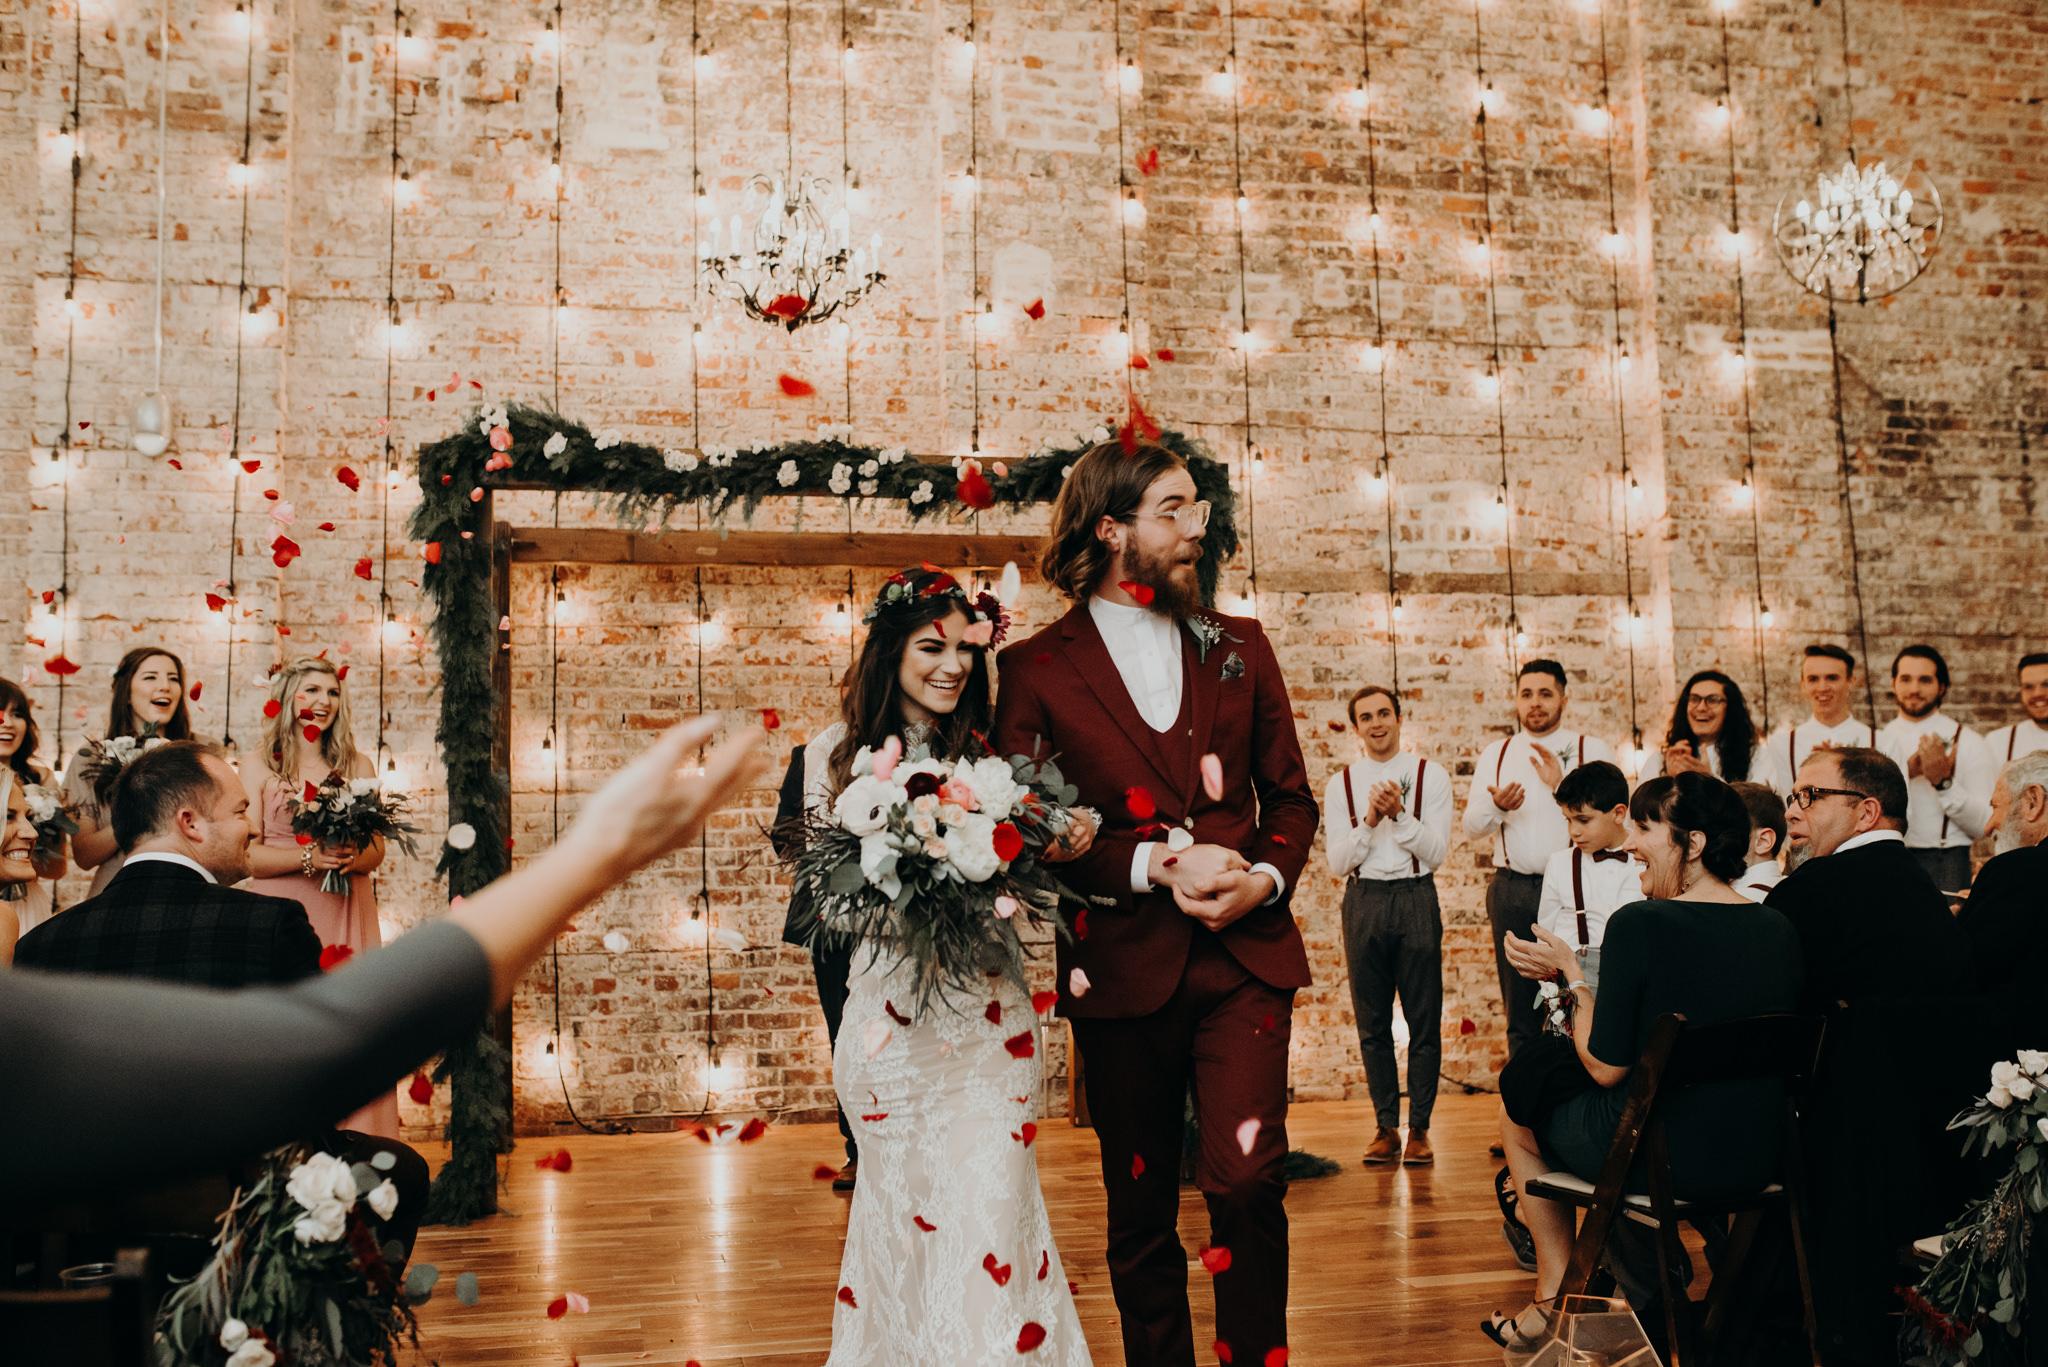 couple-wedding-indie-wedding-northern-california-112.jpg